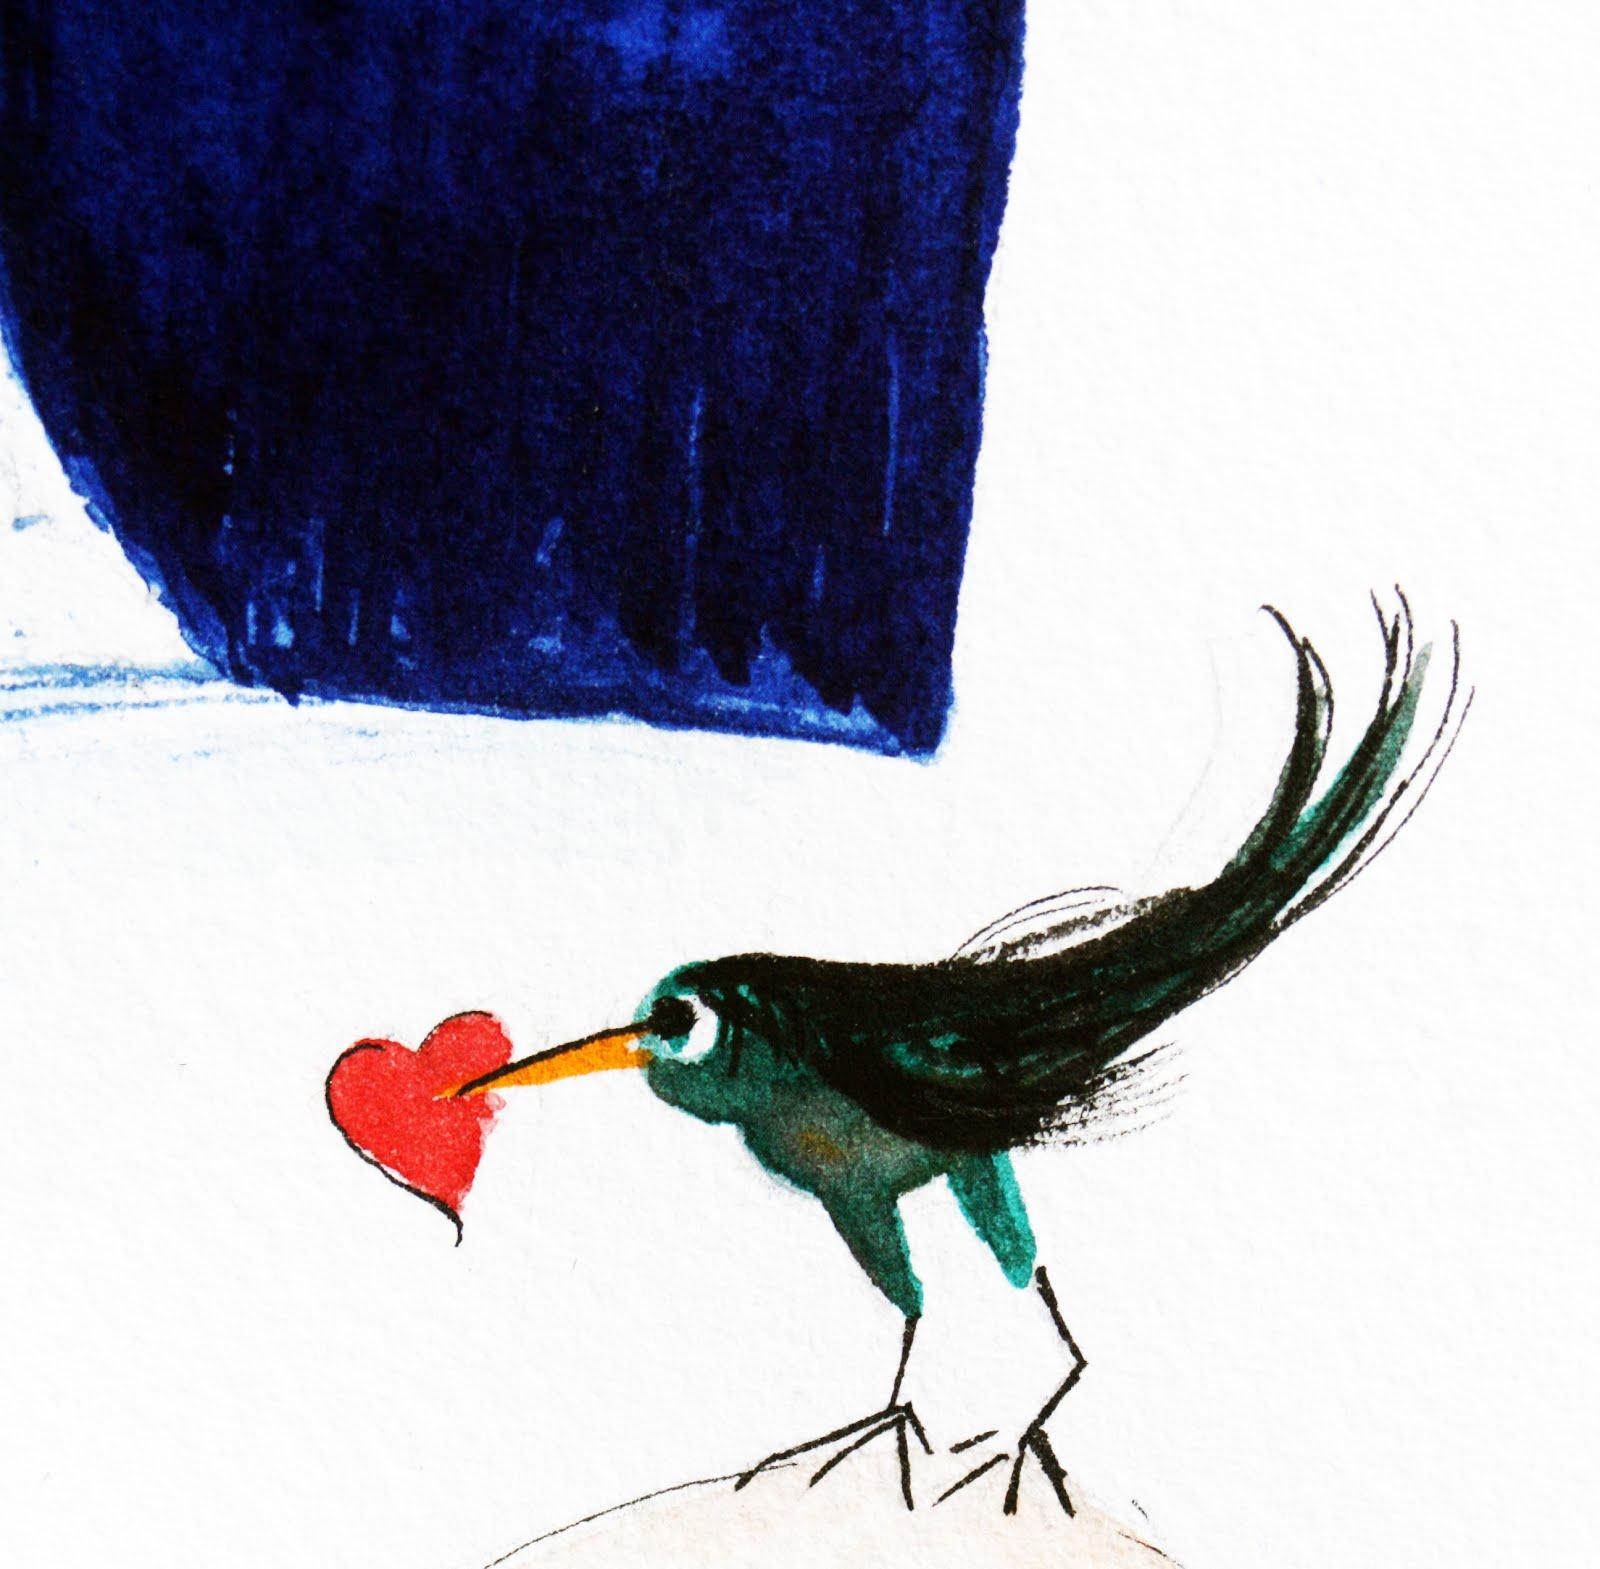 ... oiseau messager